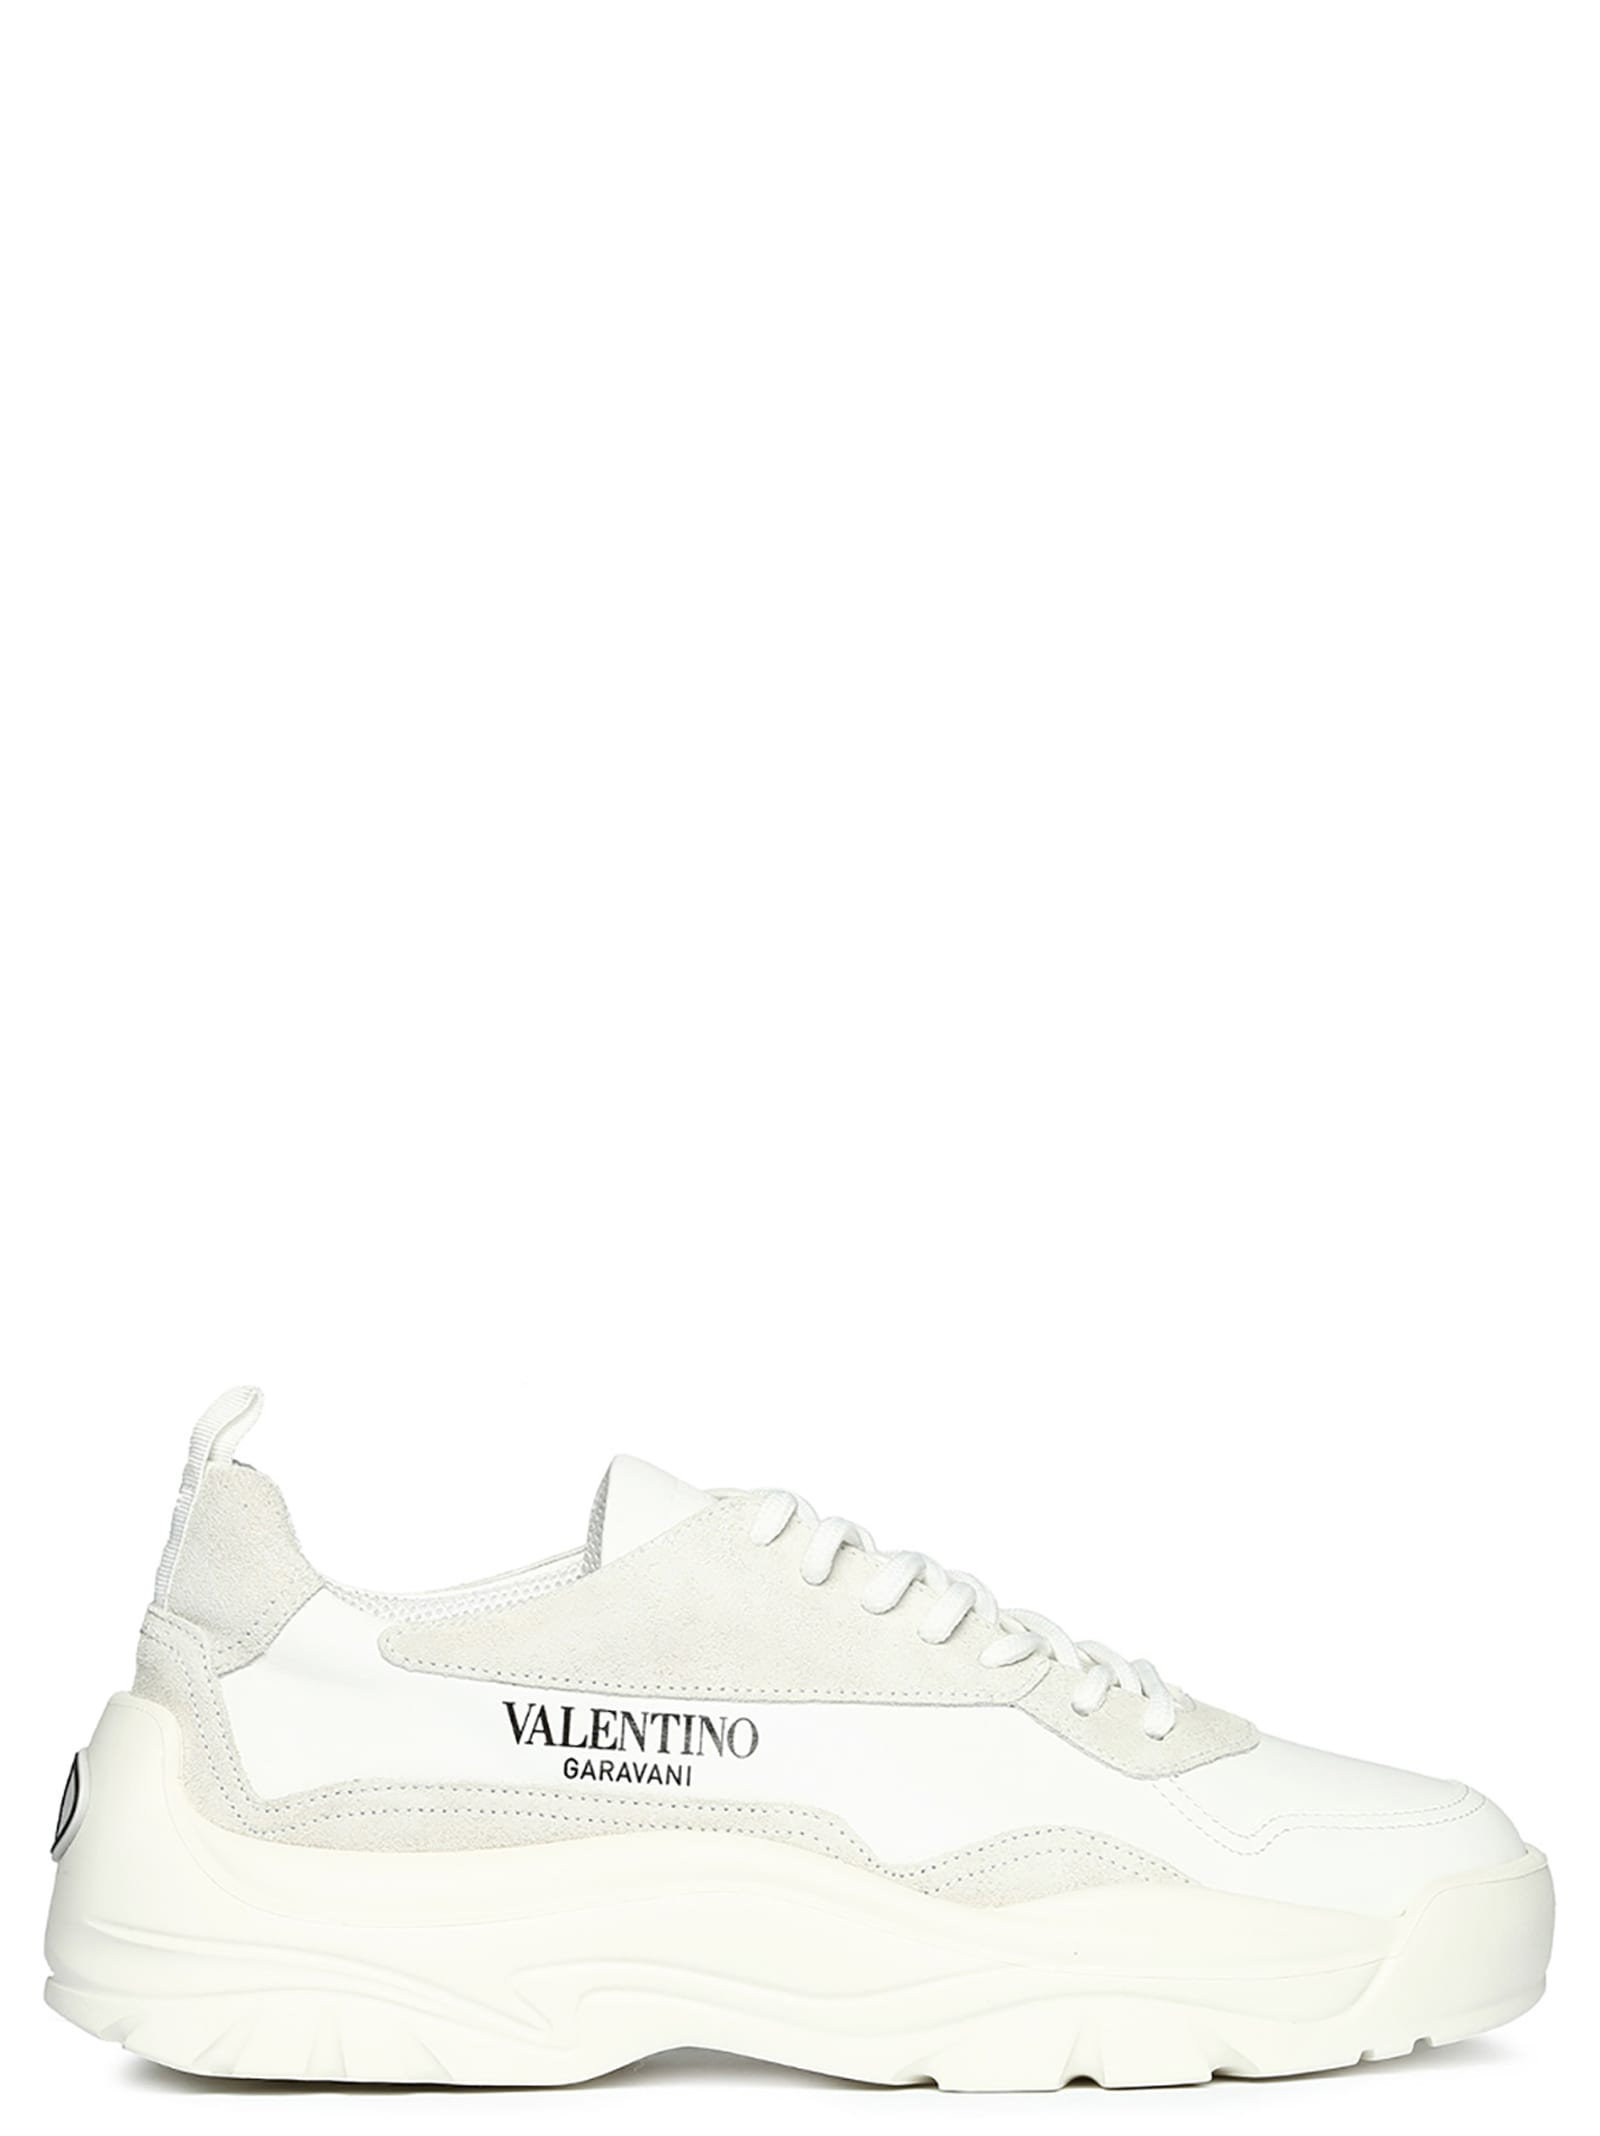 Valentino Garavani gumboy Shoes